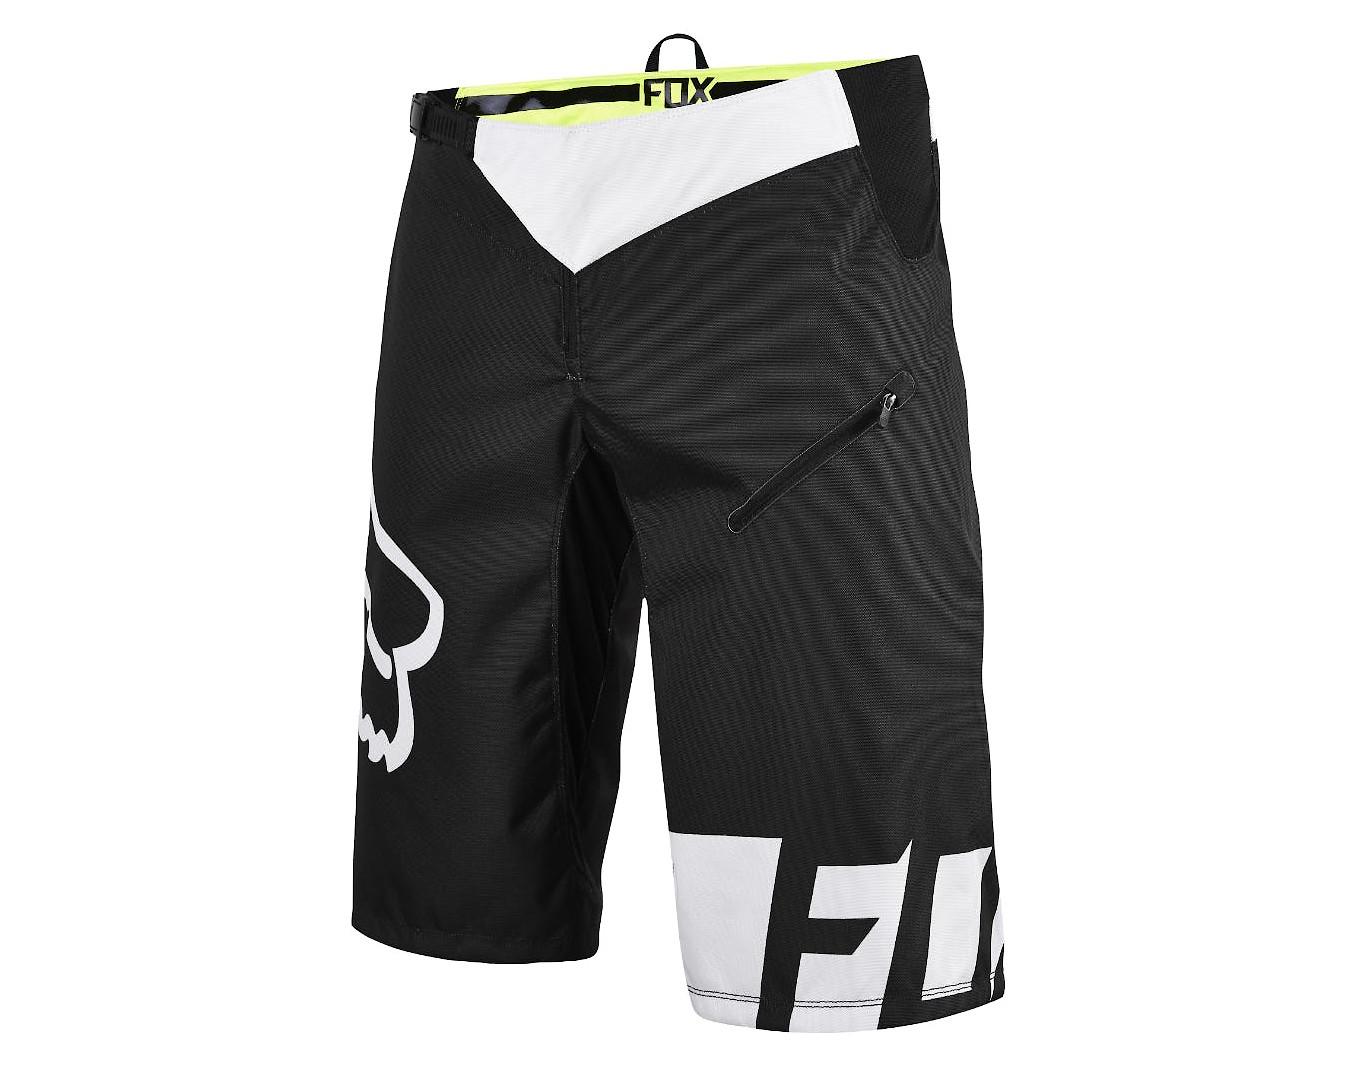 Fox Demo DH Short (2016 Black/White)